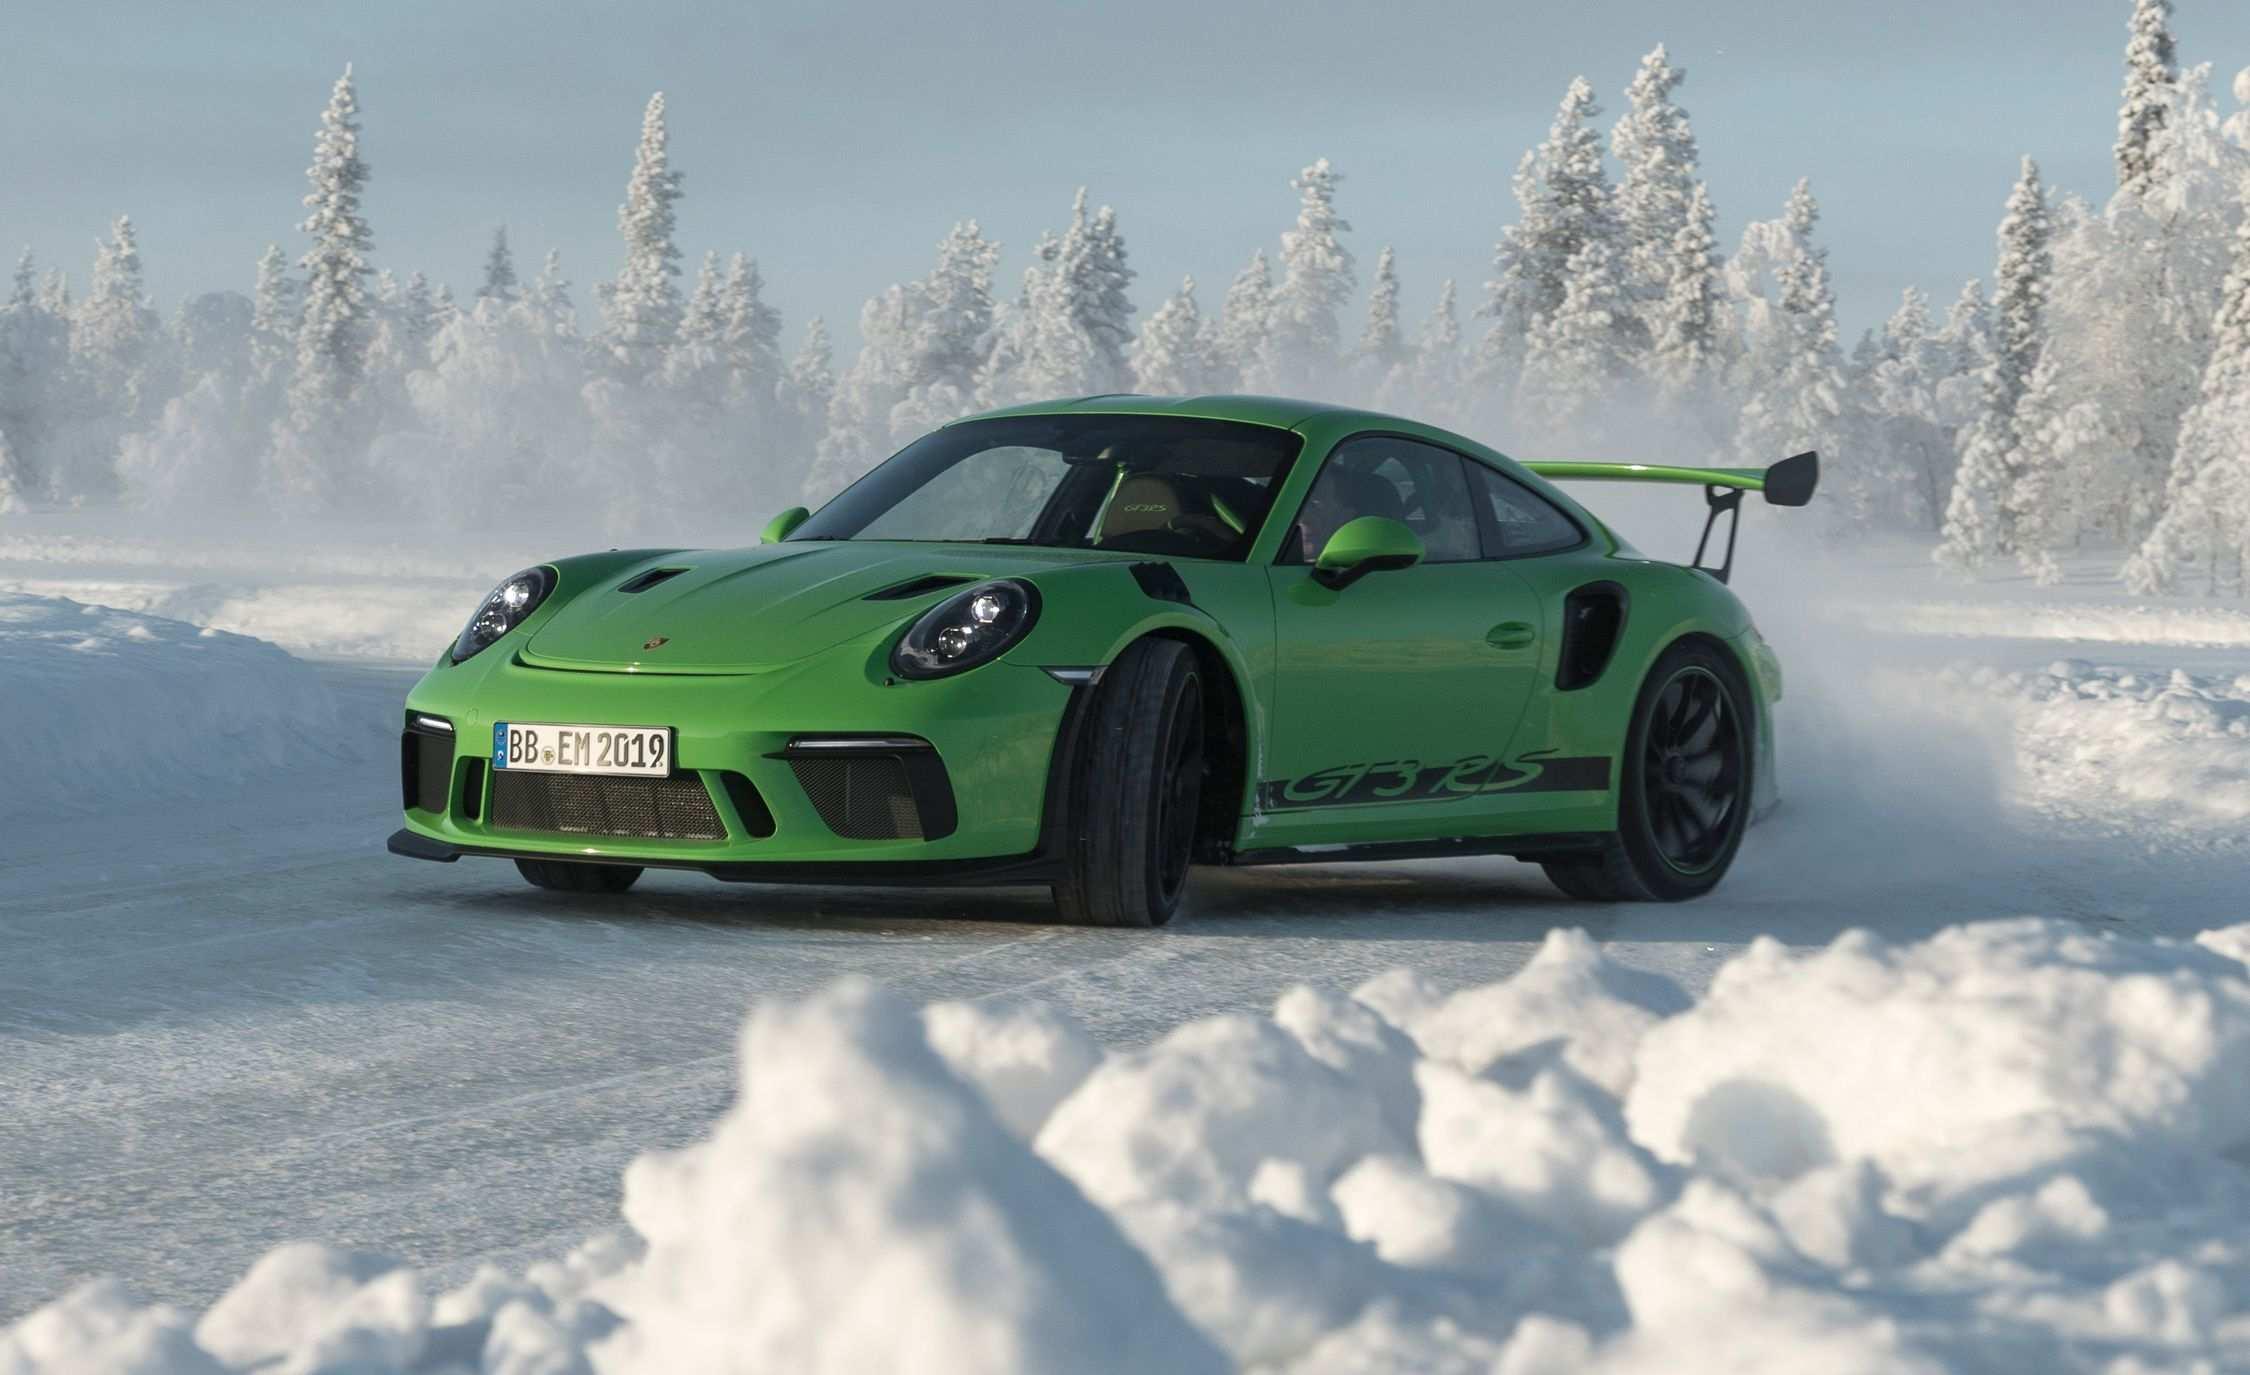 30 Concept of 2019 Porsche Gt3 Rs Speed Test with 2019 Porsche Gt3 Rs